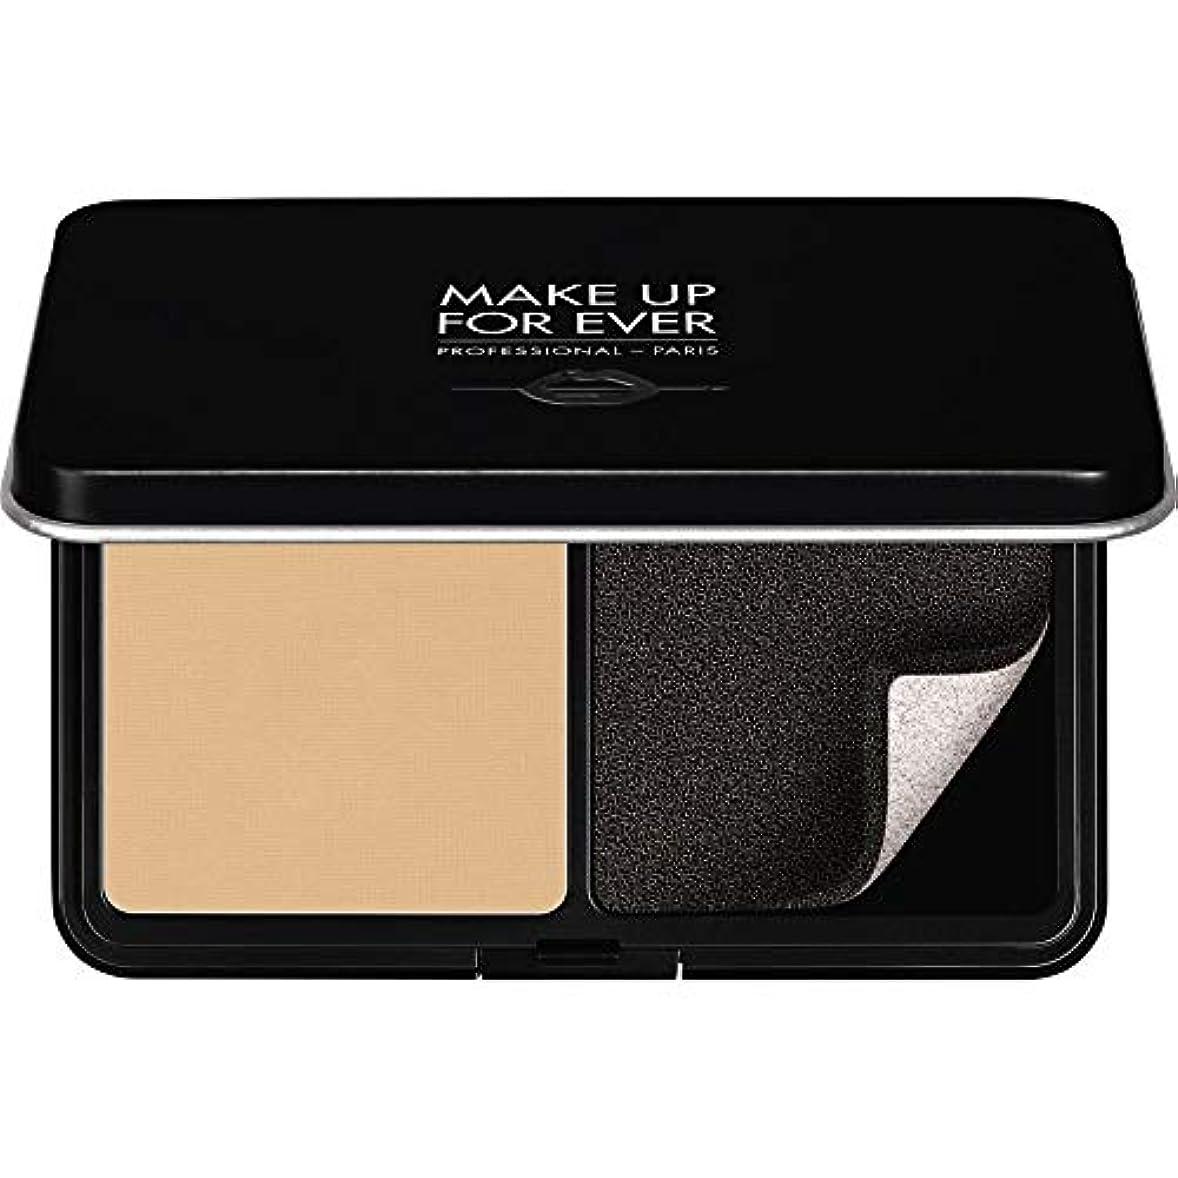 [MAKE UP FOR EVER ] パウダーファンデーション11GののY225をぼかし、これまでマットベルベットの肌を補う - 大理石 - MAKE UP FOR EVER Matte Velvet Skin Blurring...